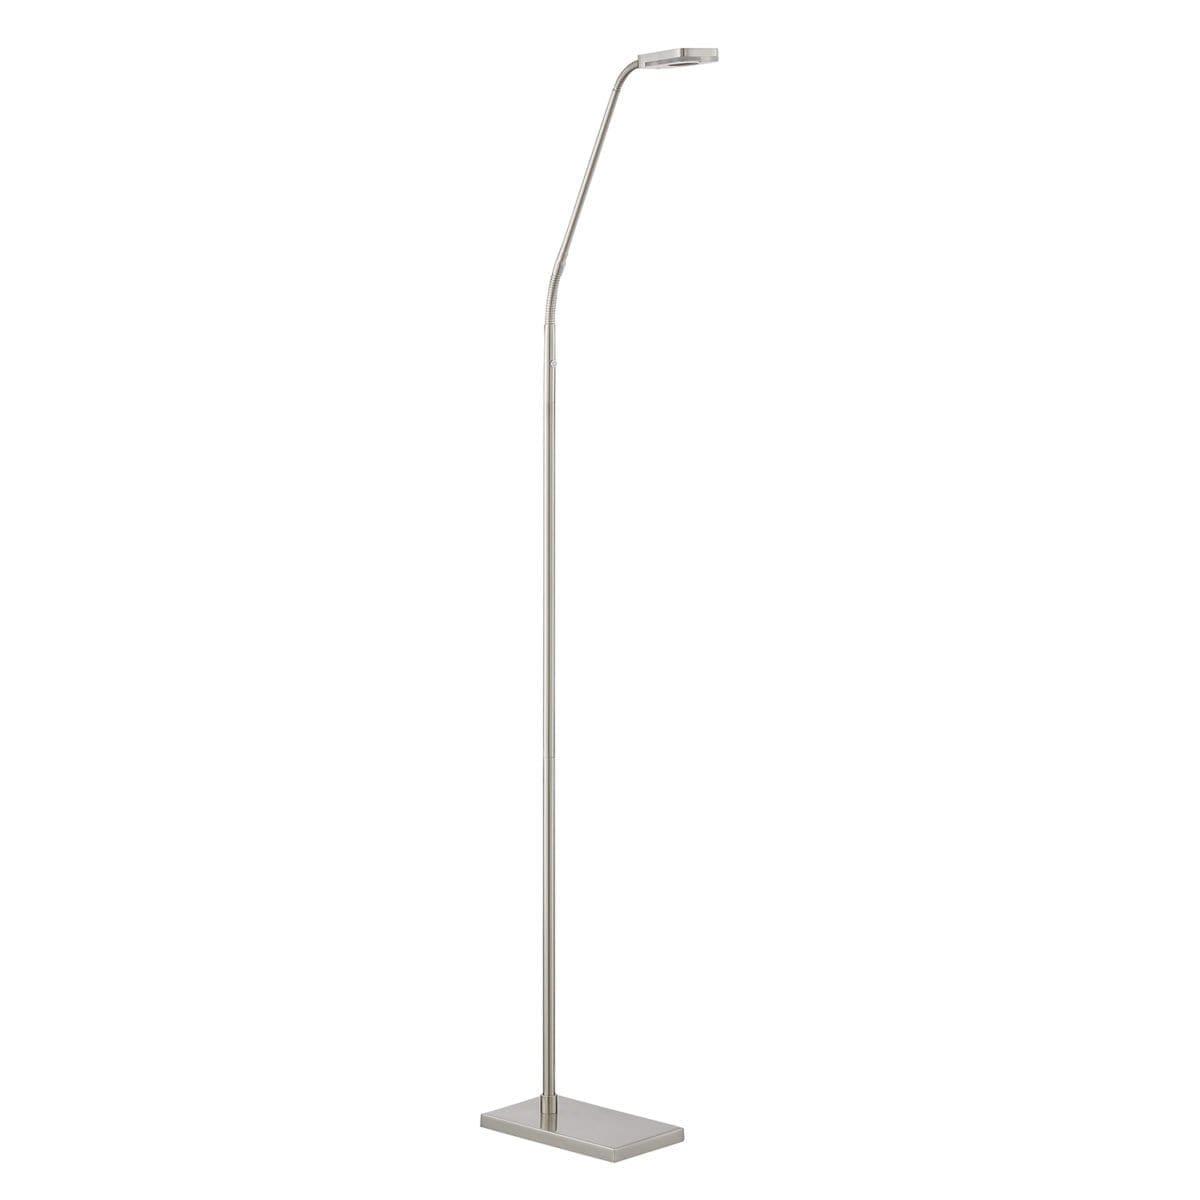 148 FL4094 SN LED Floor Lamp Regular Price $159.99 Sale Price $111.99